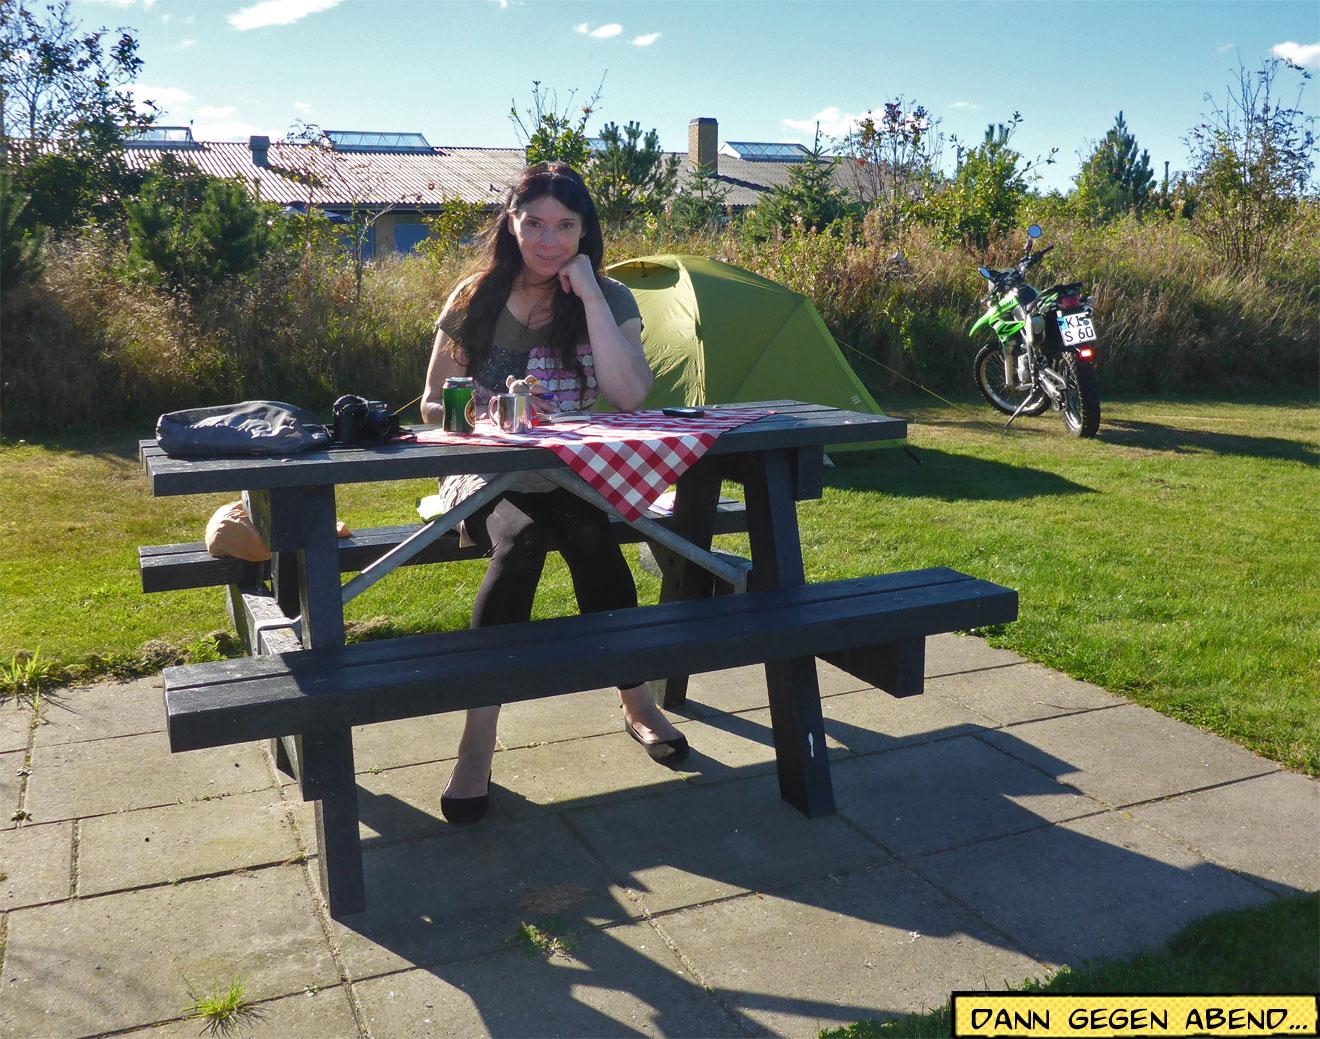 Svenja am Picknicktisch vorm Zelt